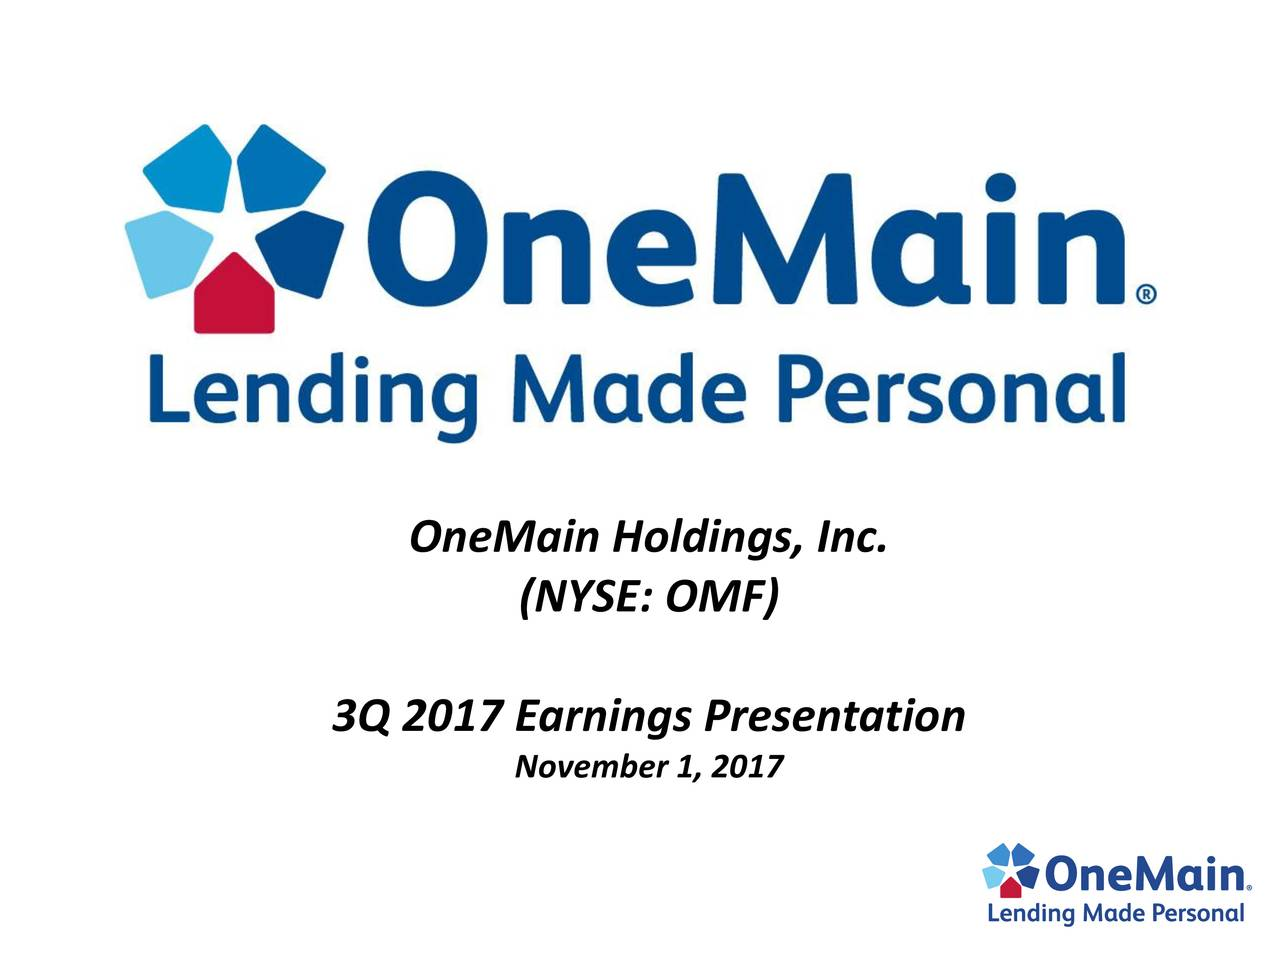 (NYSE: OMF) 3Q 2017 Earnings Presentation November 1, 2017